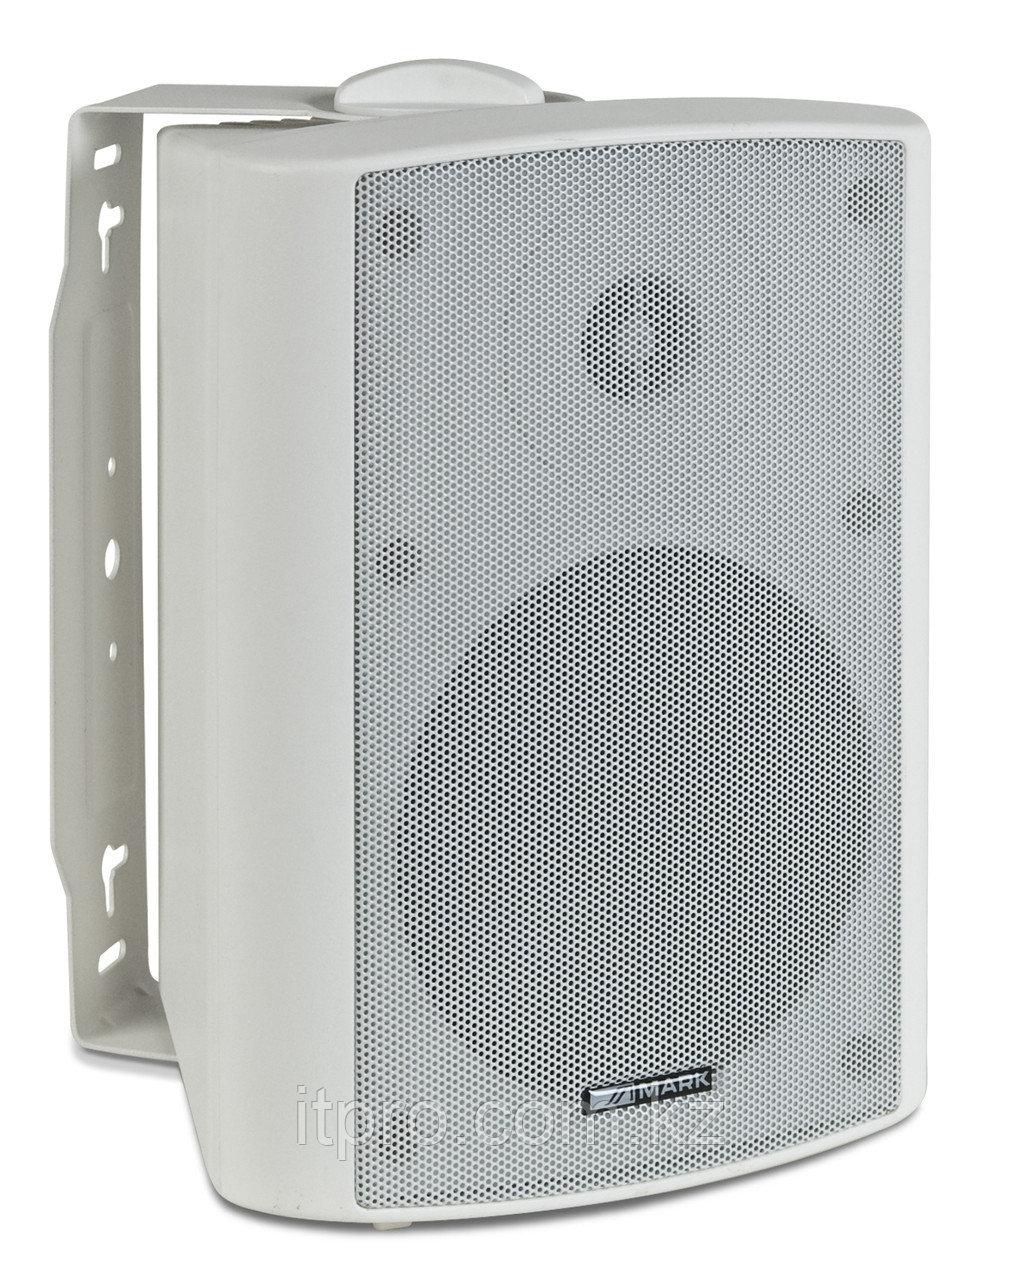 Комплект настенных громкоговорителей MARK MONITOR 3T WHITE (Цена за 2 шт)